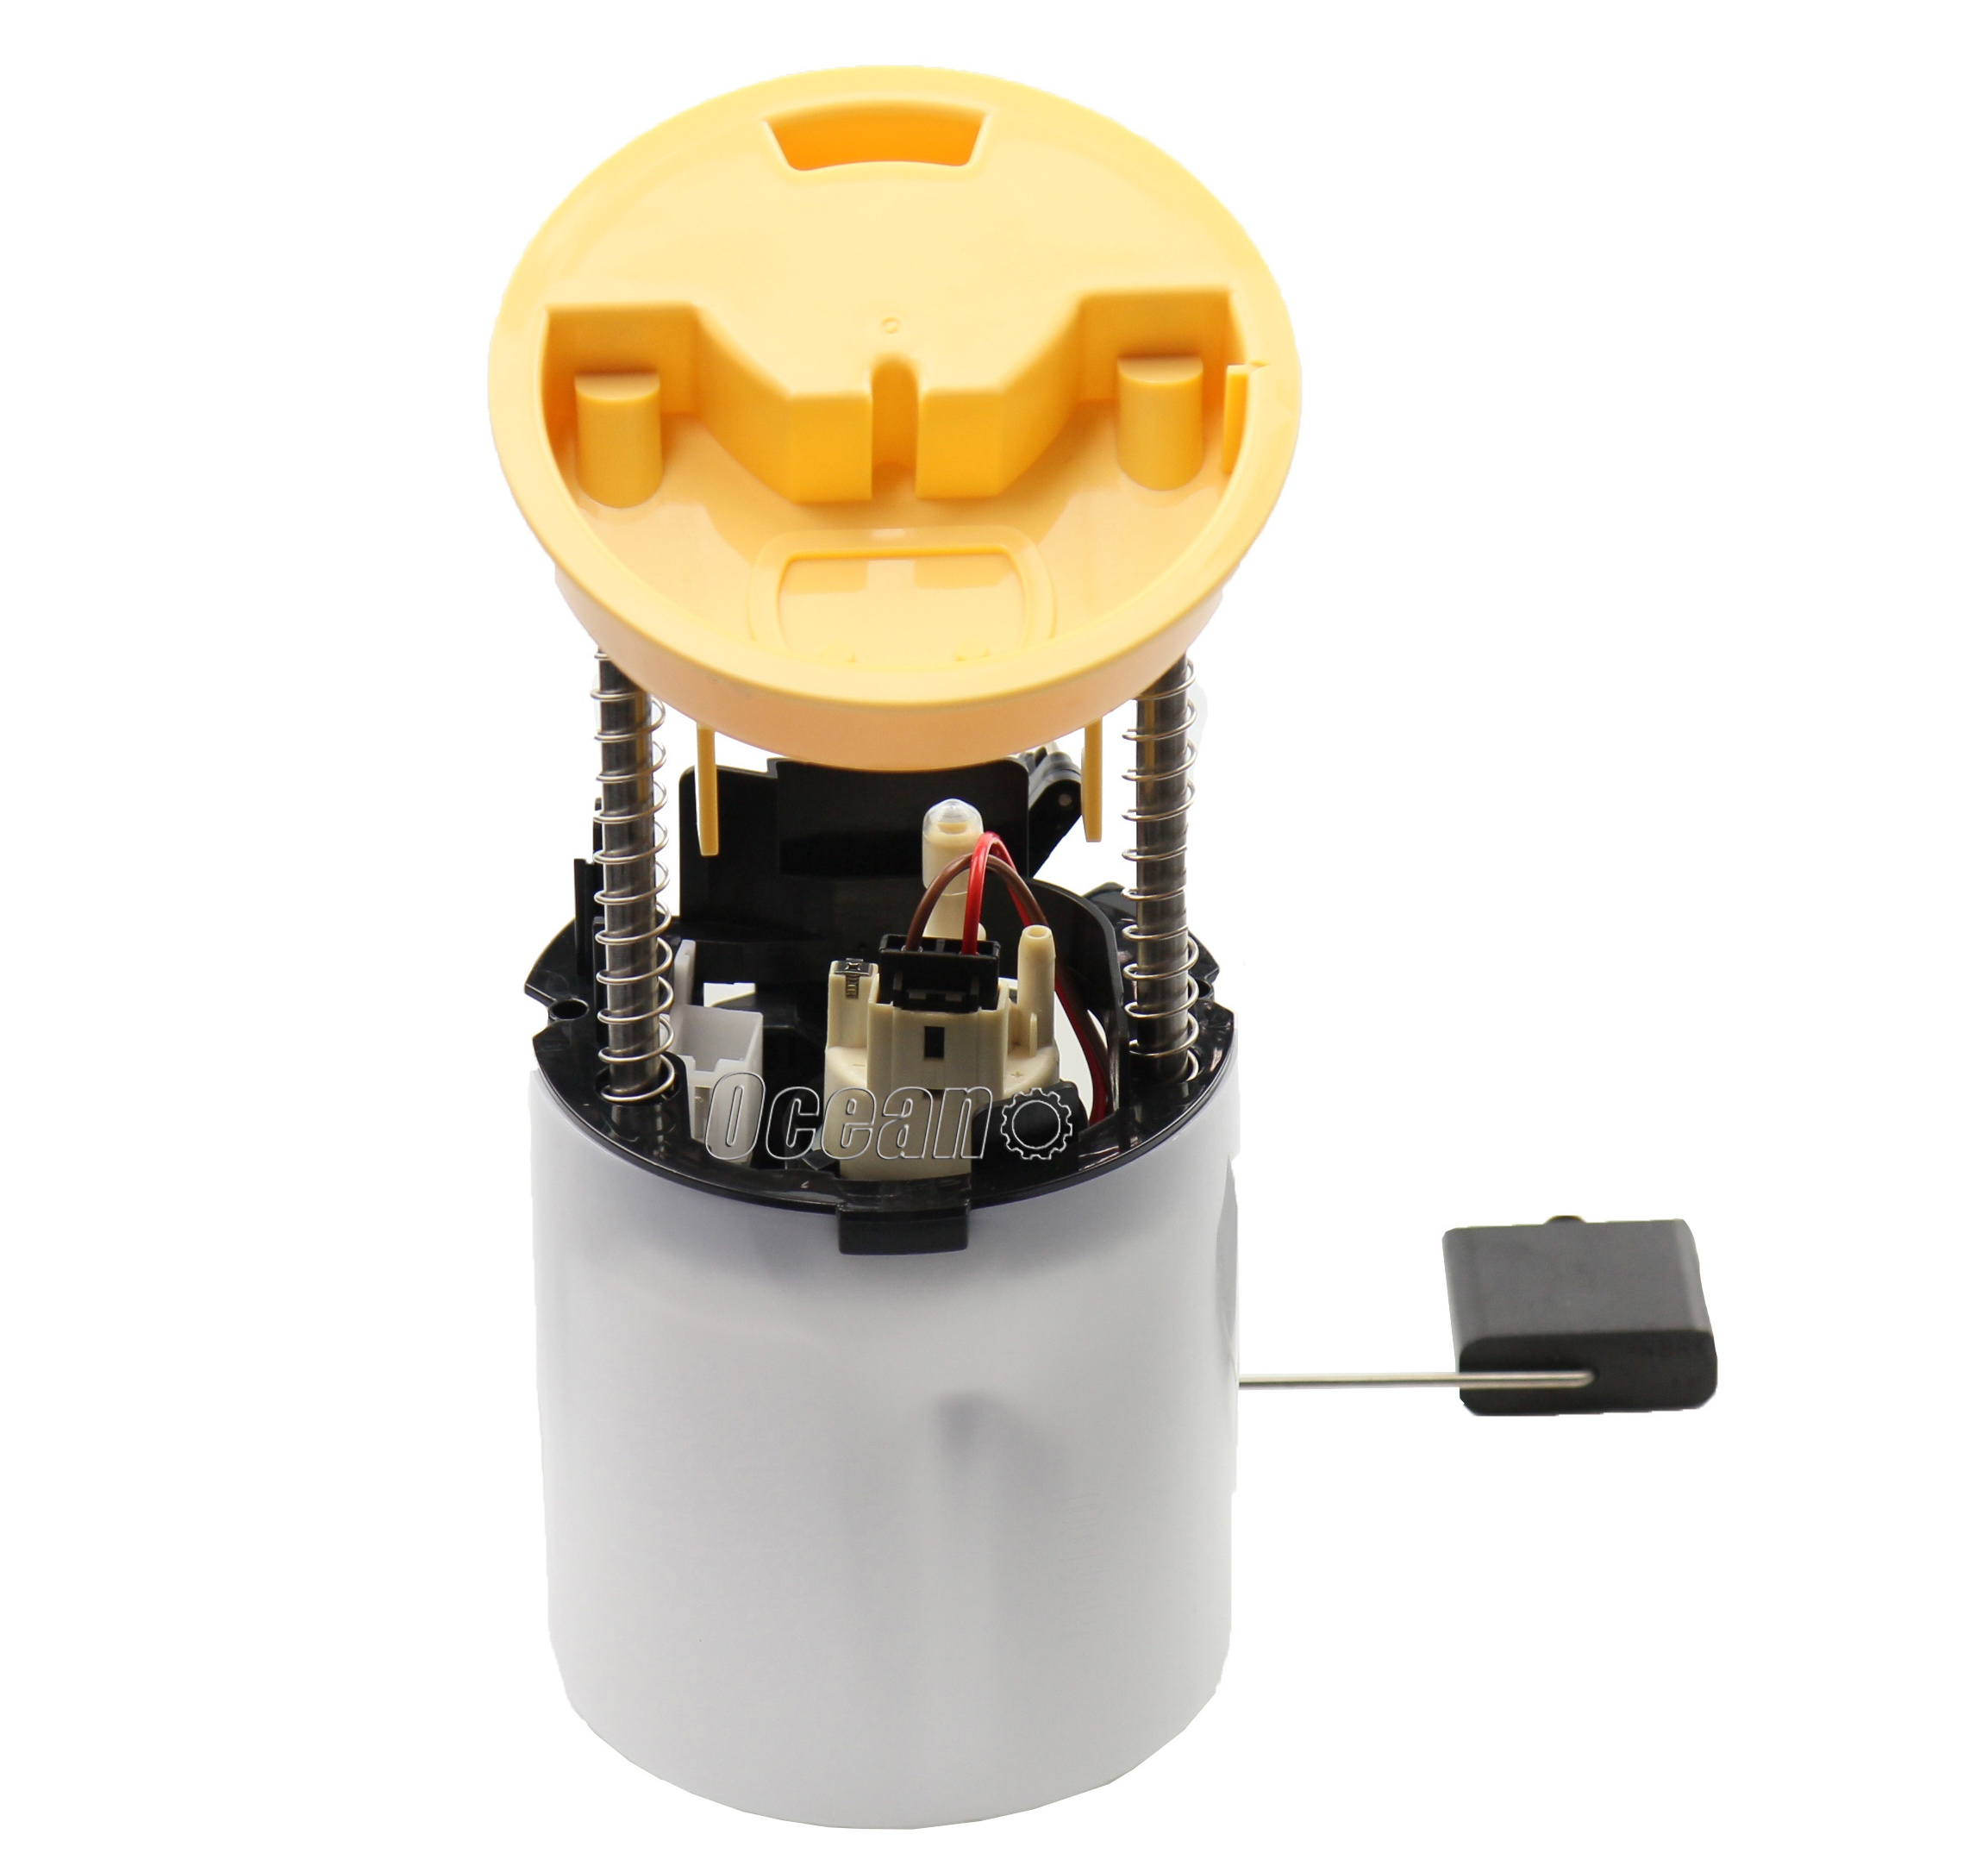 New fuel pump module assembly mercedes benz cls500 e320 for 2007 mercedes benz e350 fuel pump